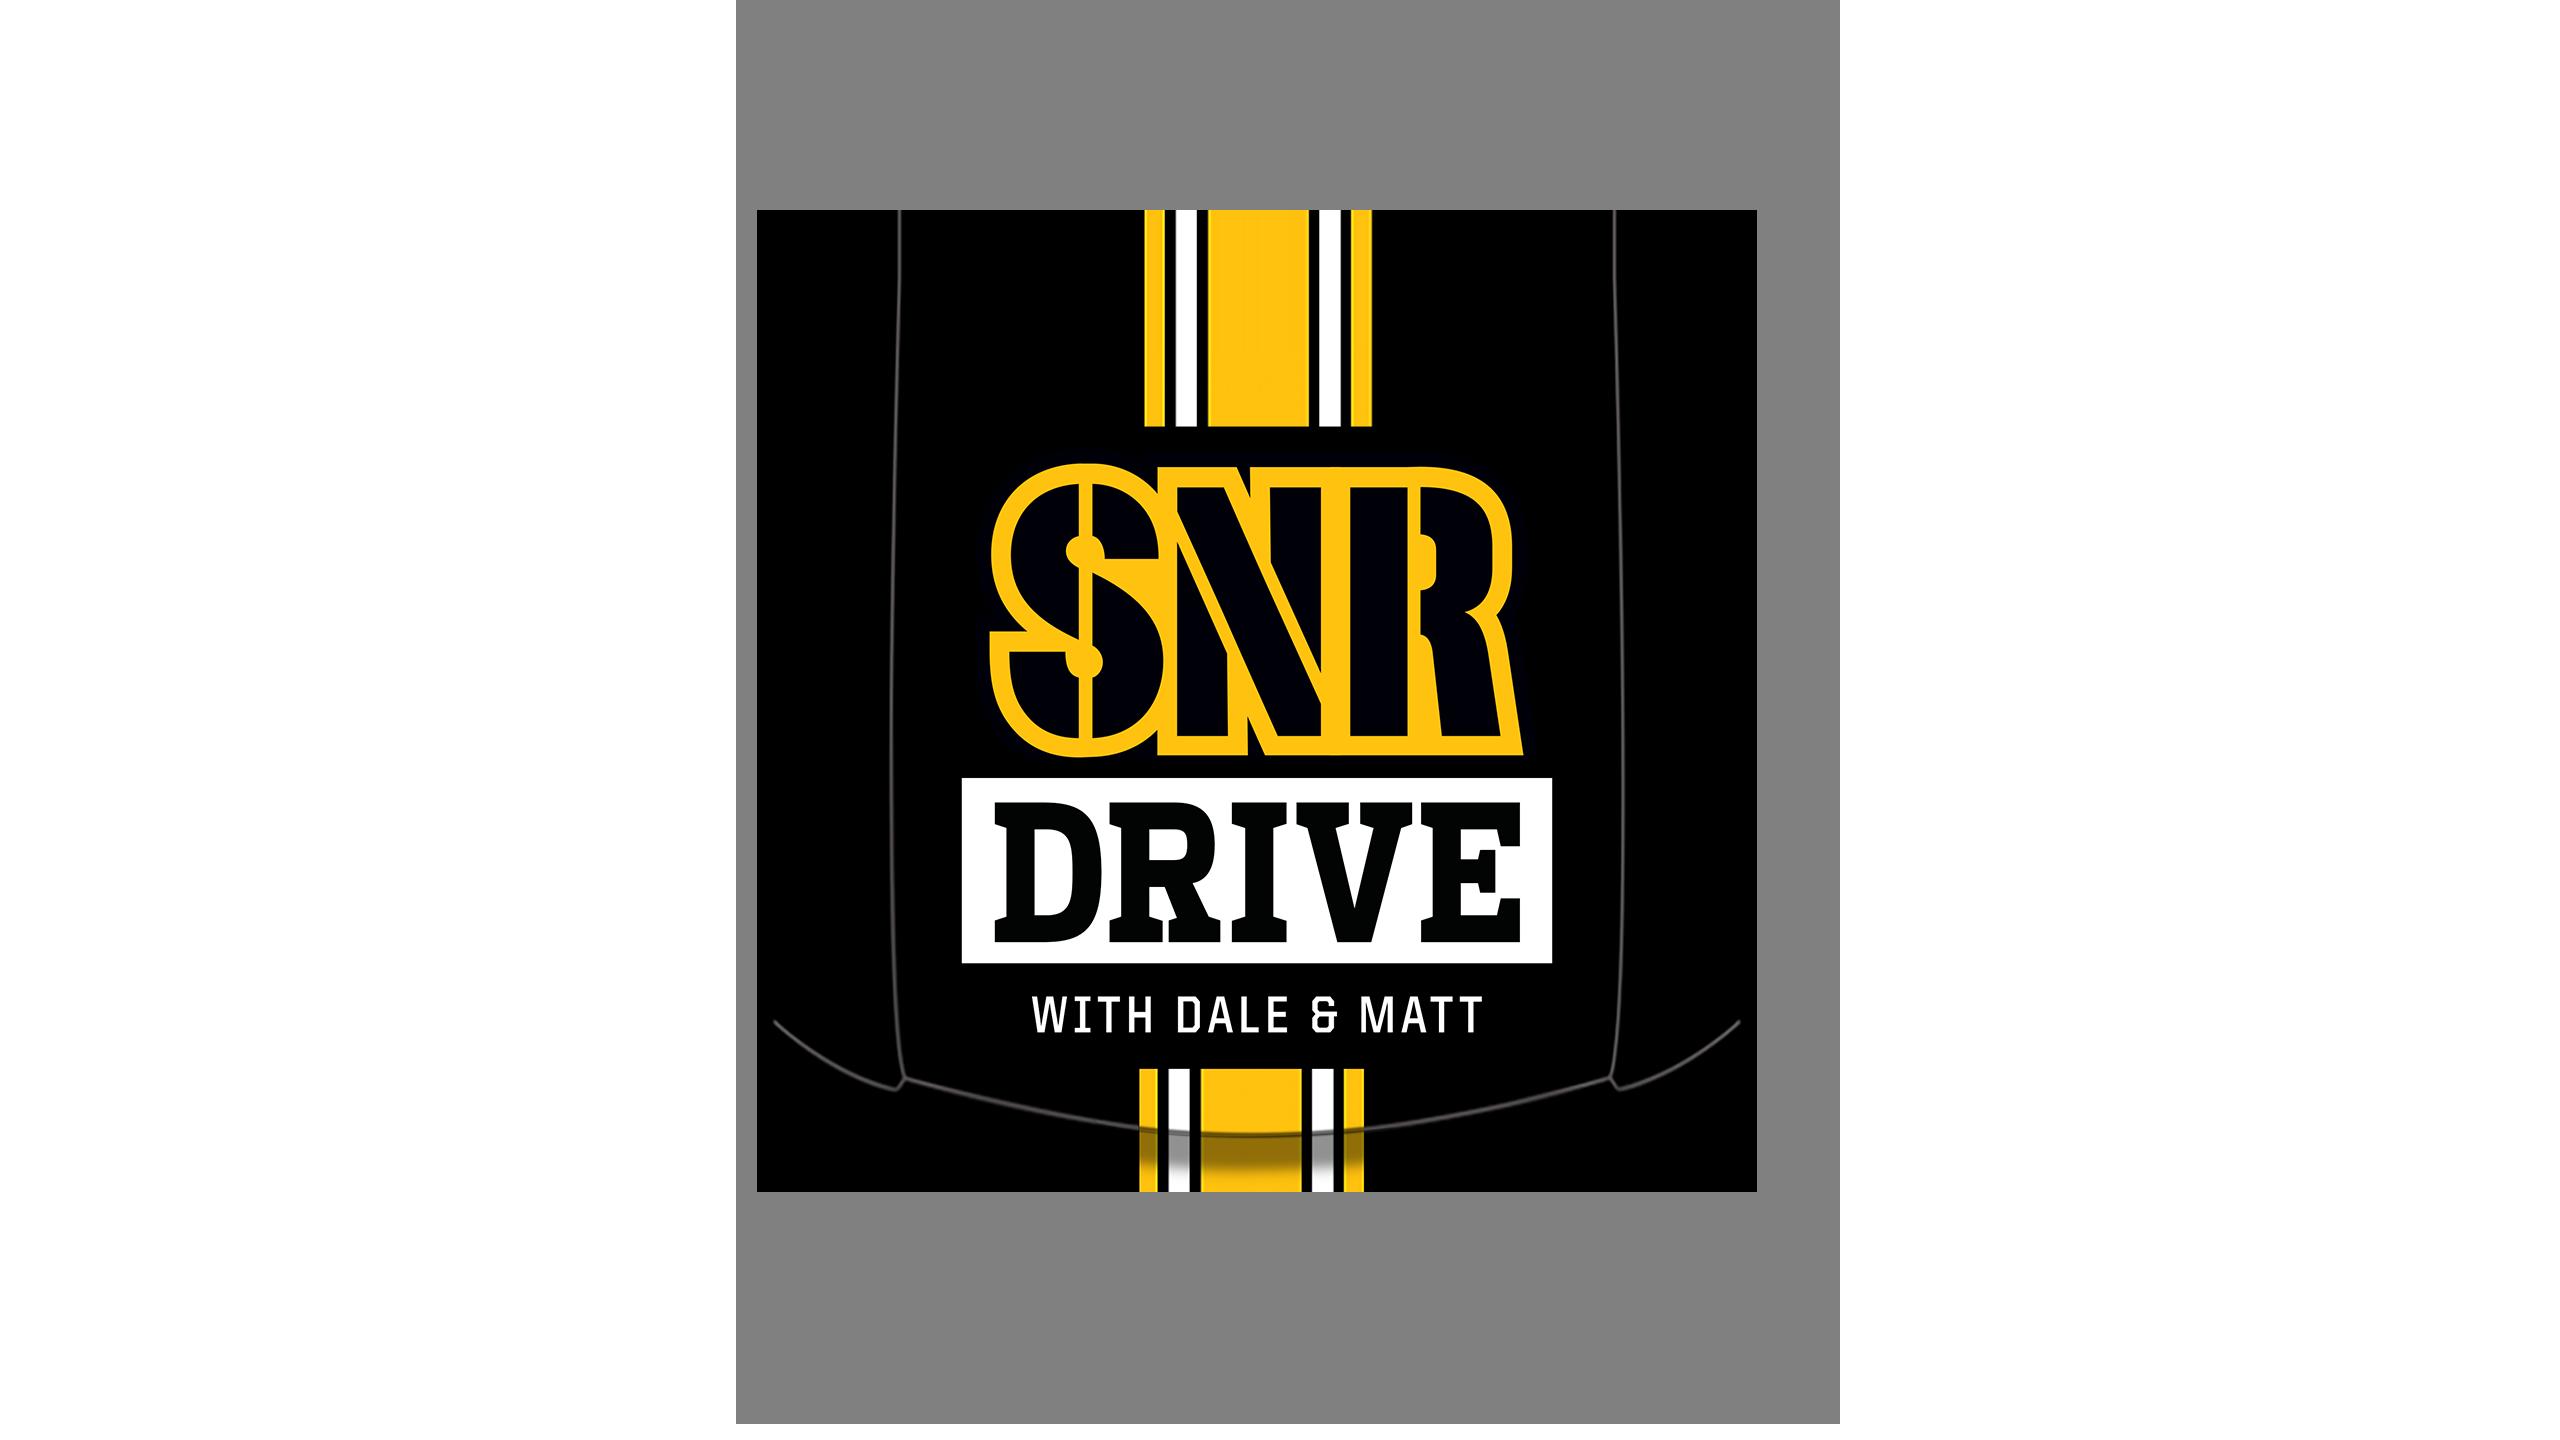 SNR_Drive_Matt_Dale_logo